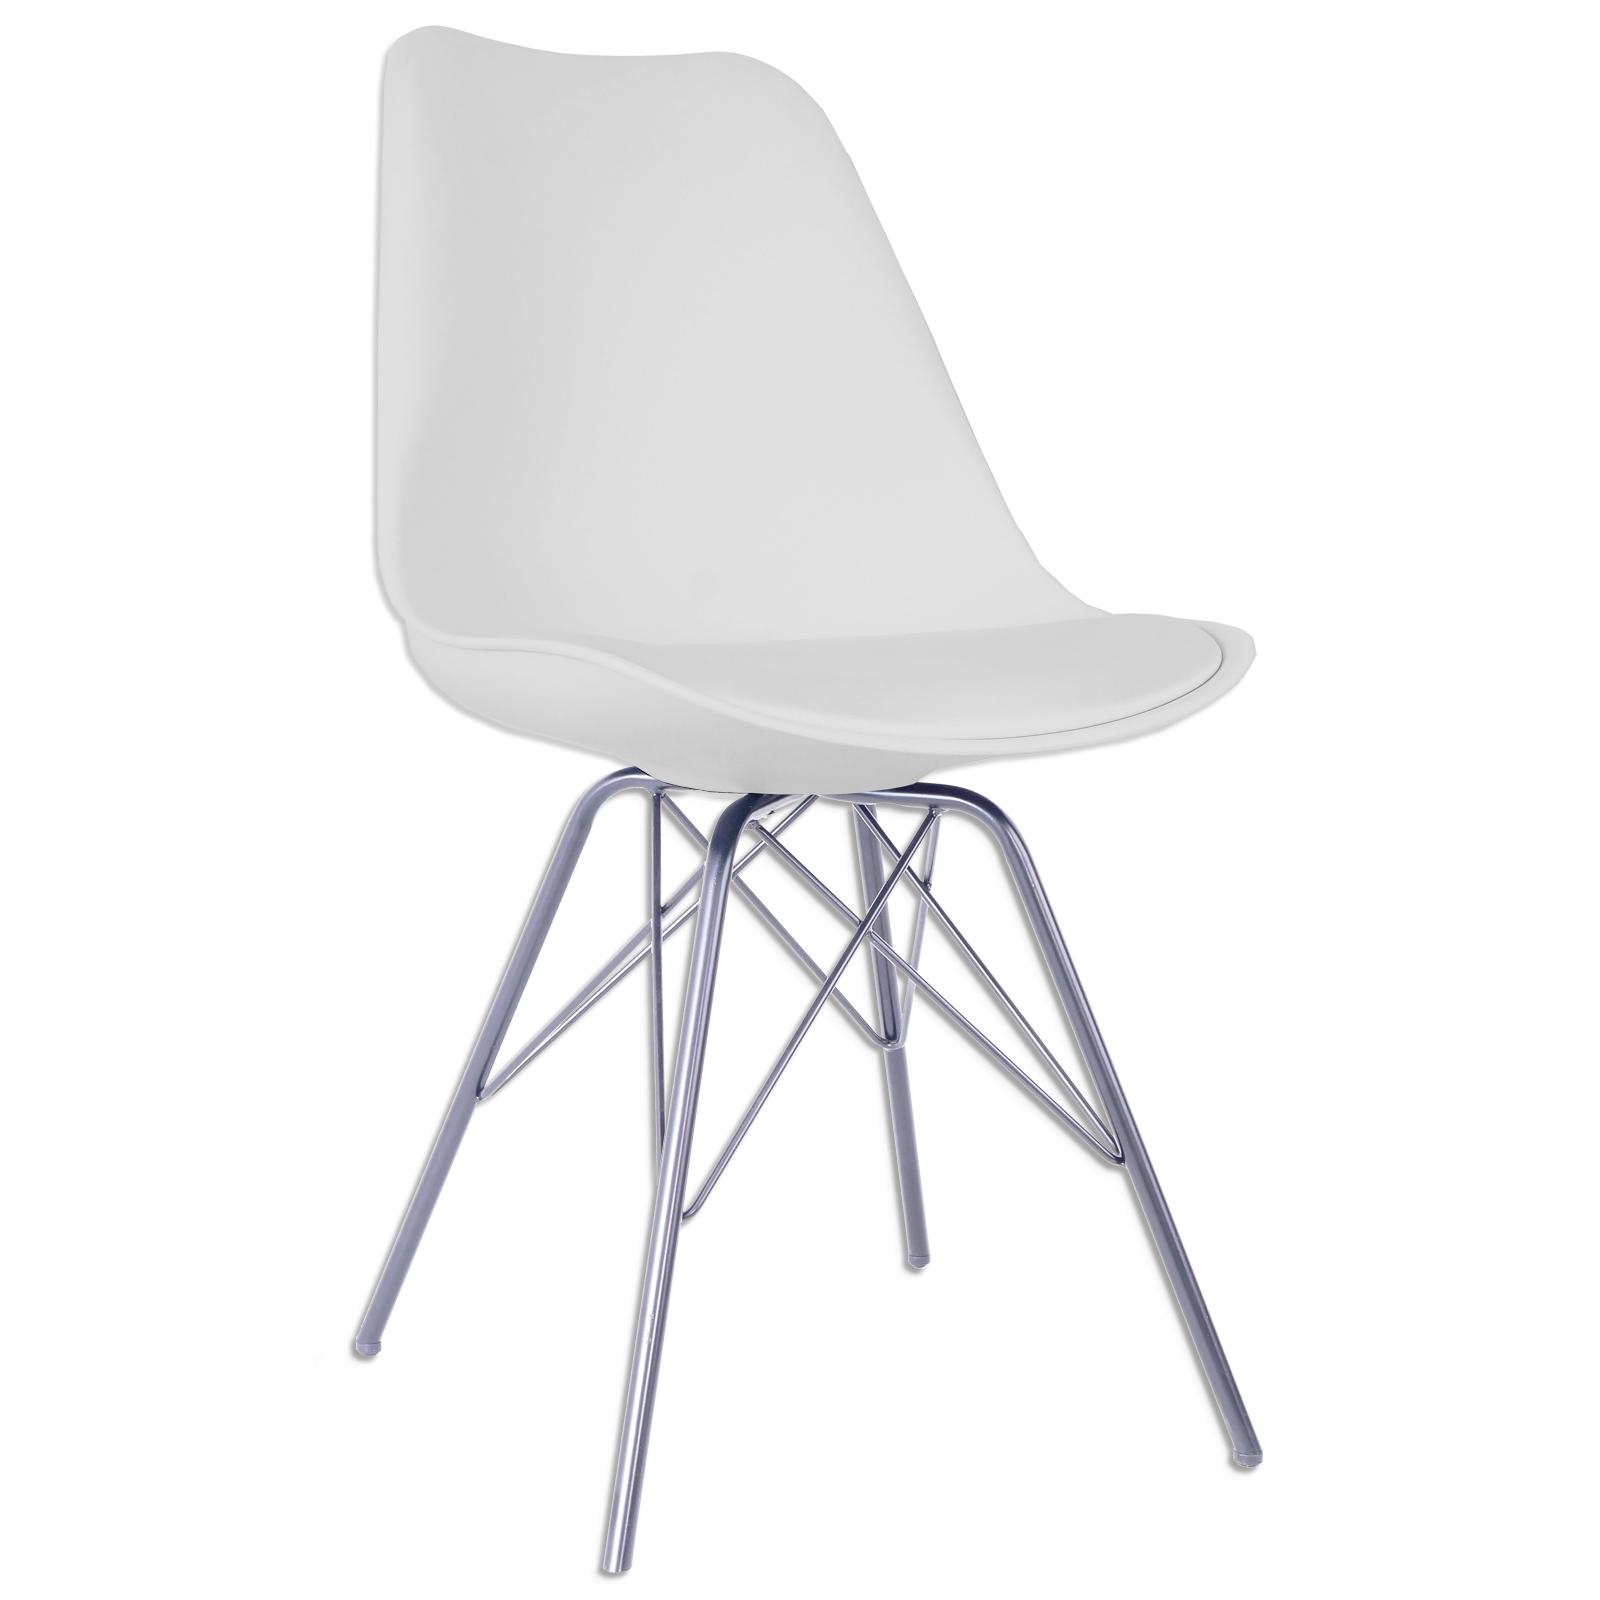 Stuhl weiß Chrom Kunstleder